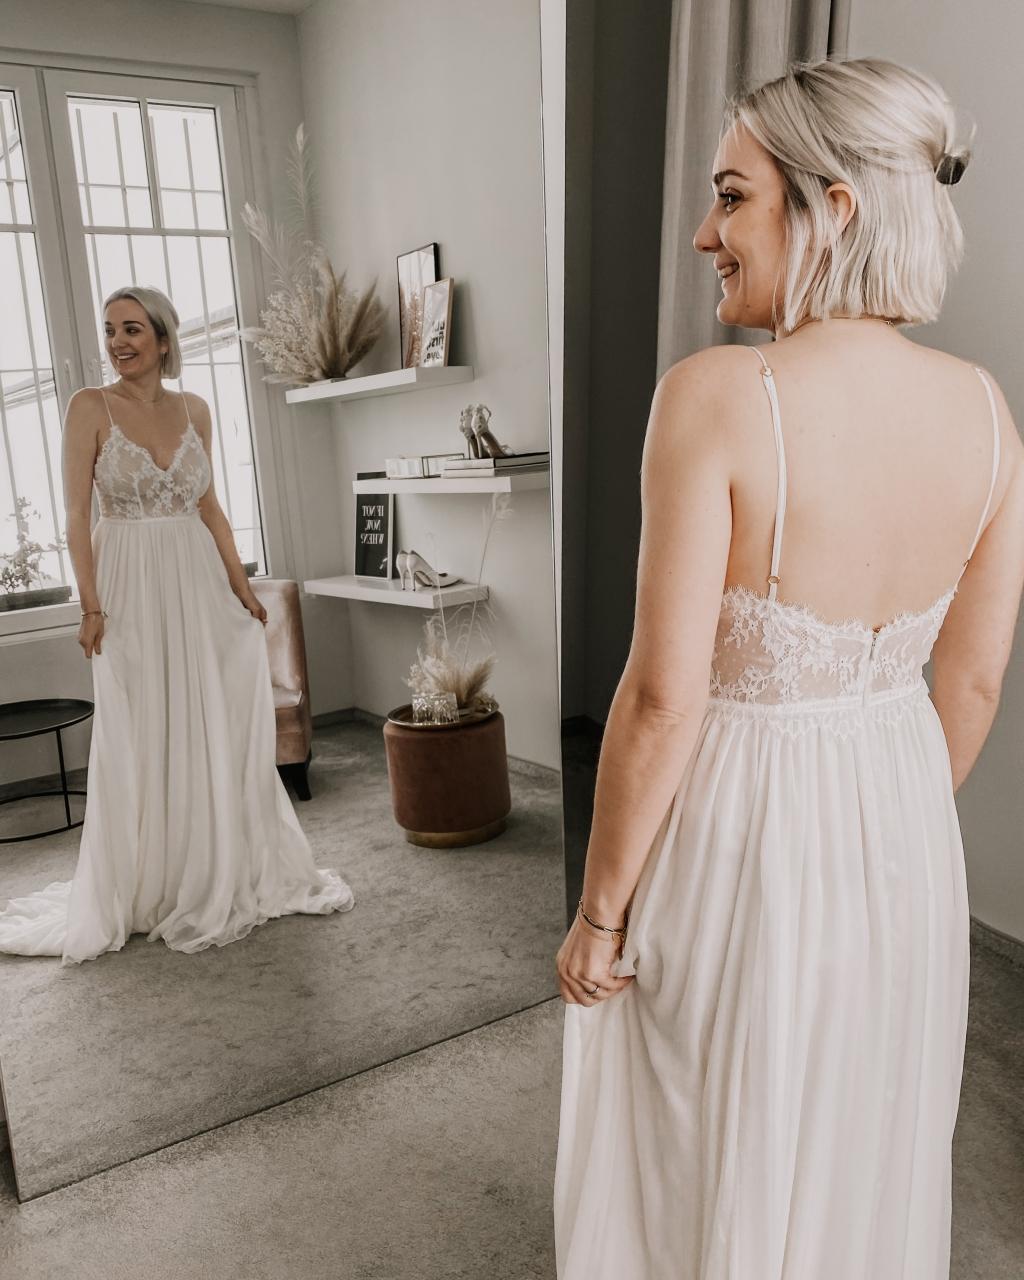 GIRASOL Dress - Brautkleid